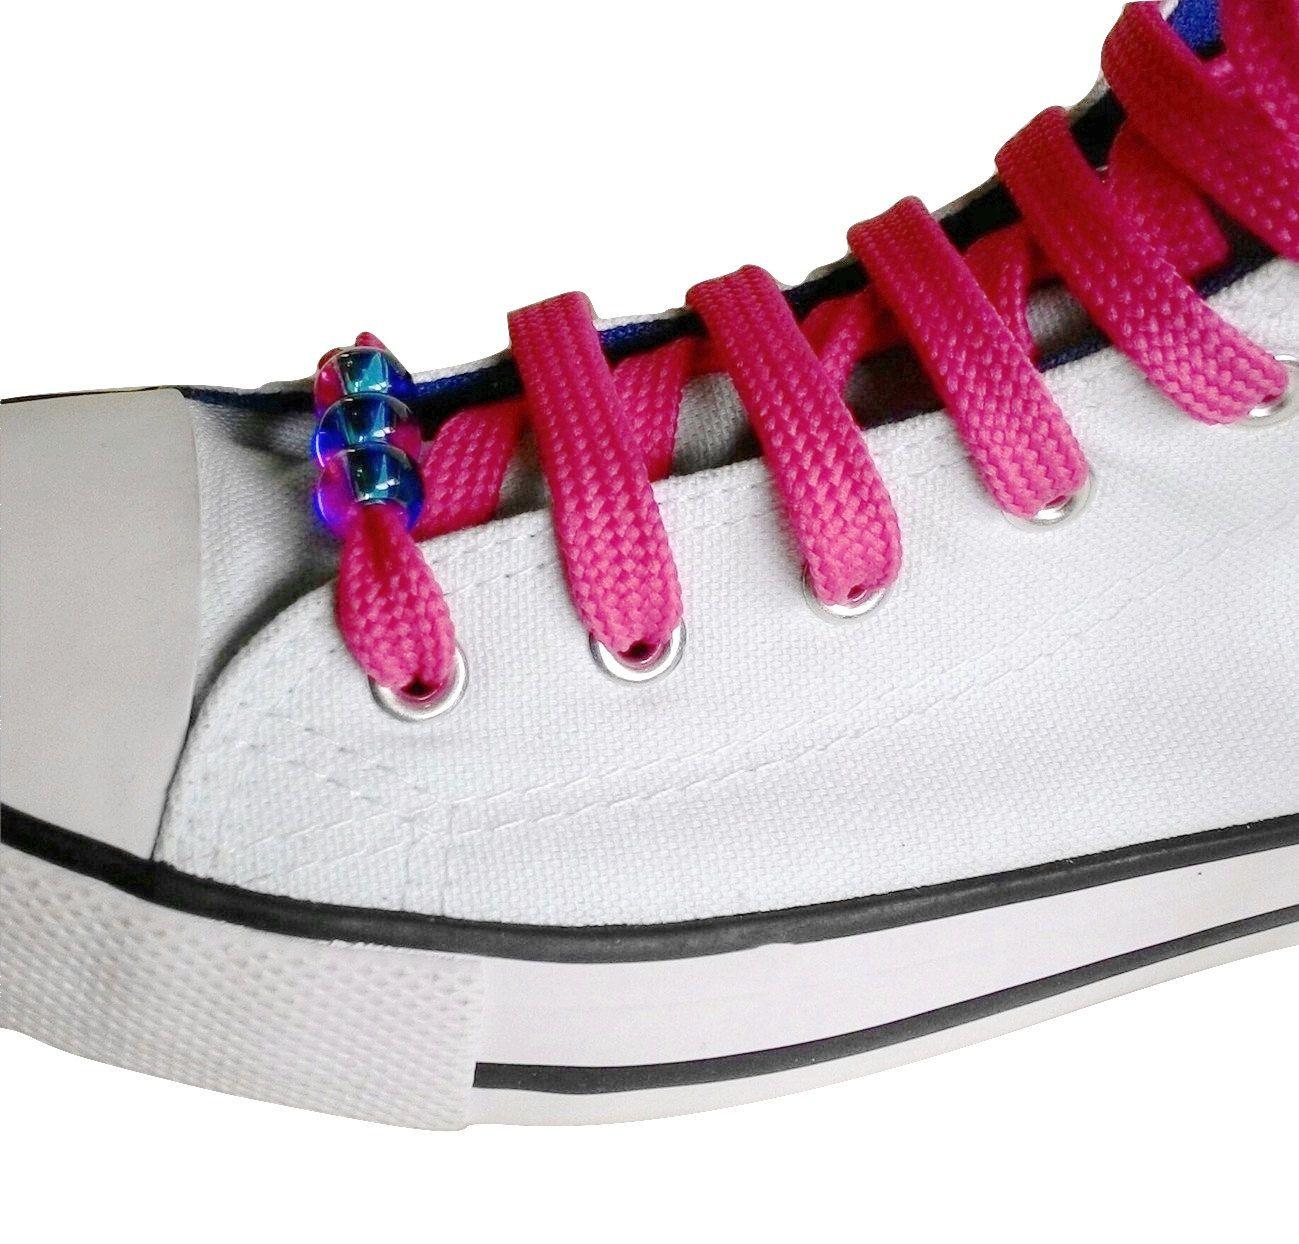 45e281cb846c30 Polyester shoelaces